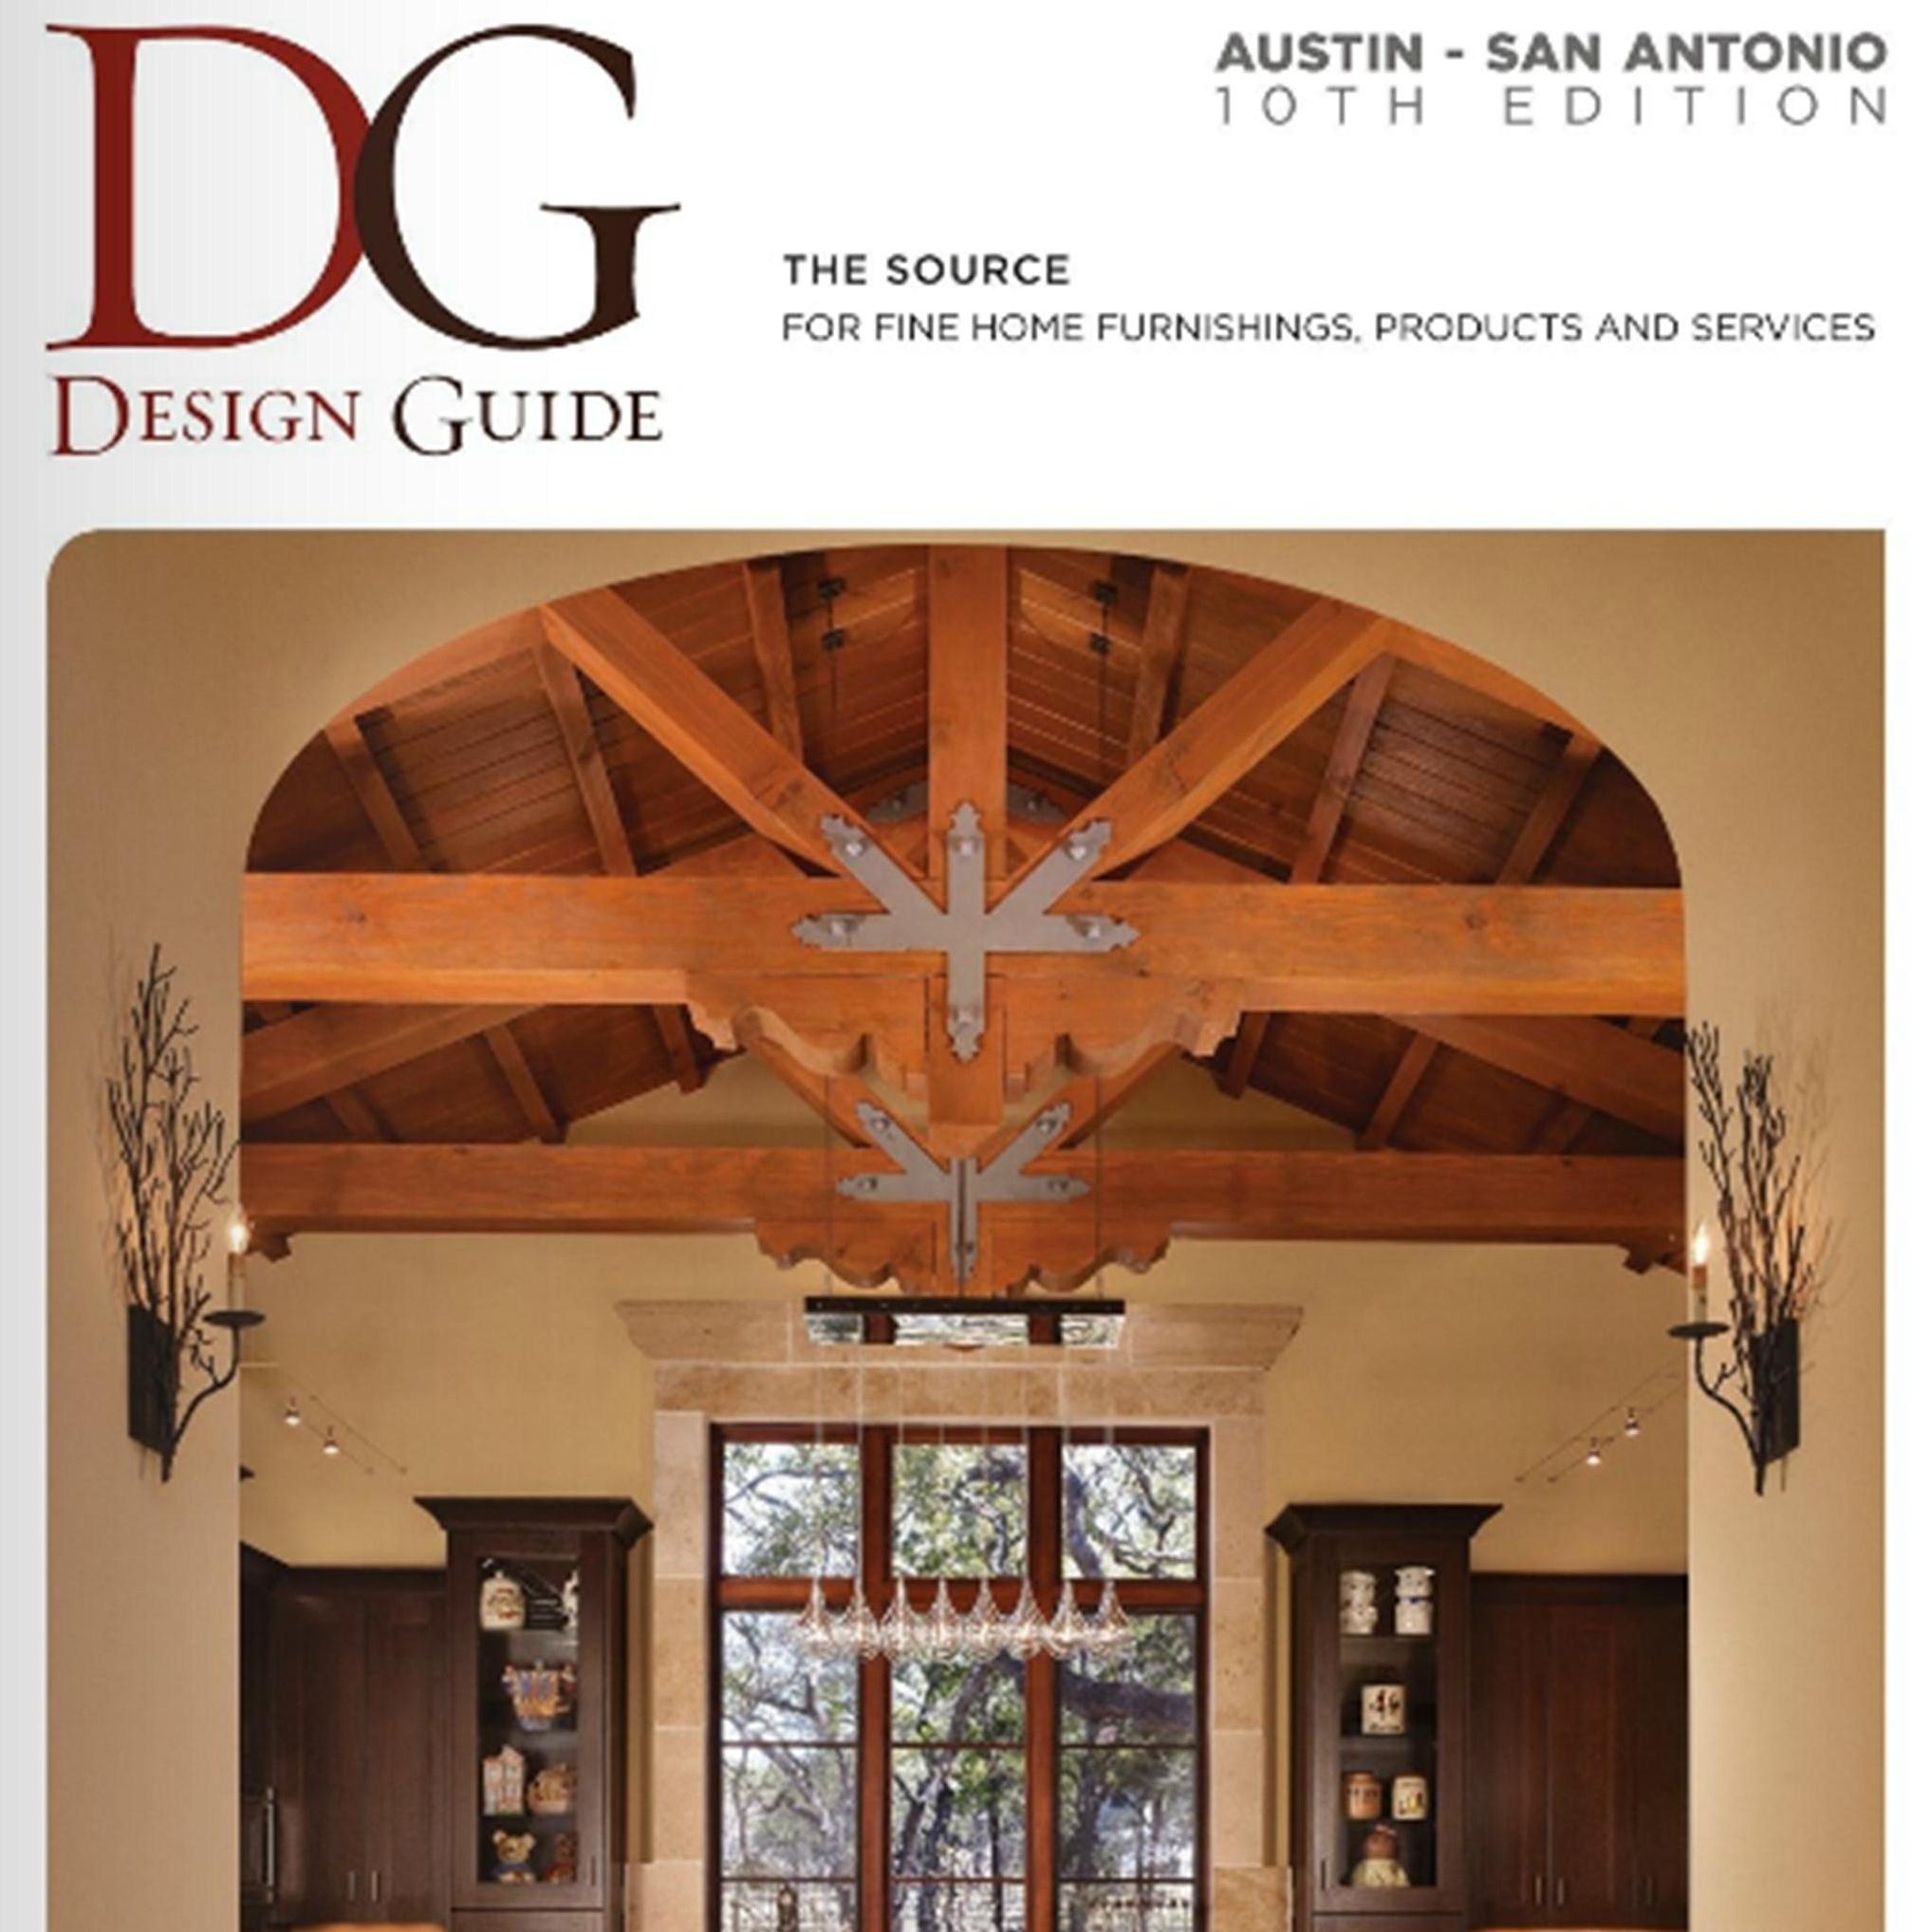 Design Guide 10th Edition 2011.jpg